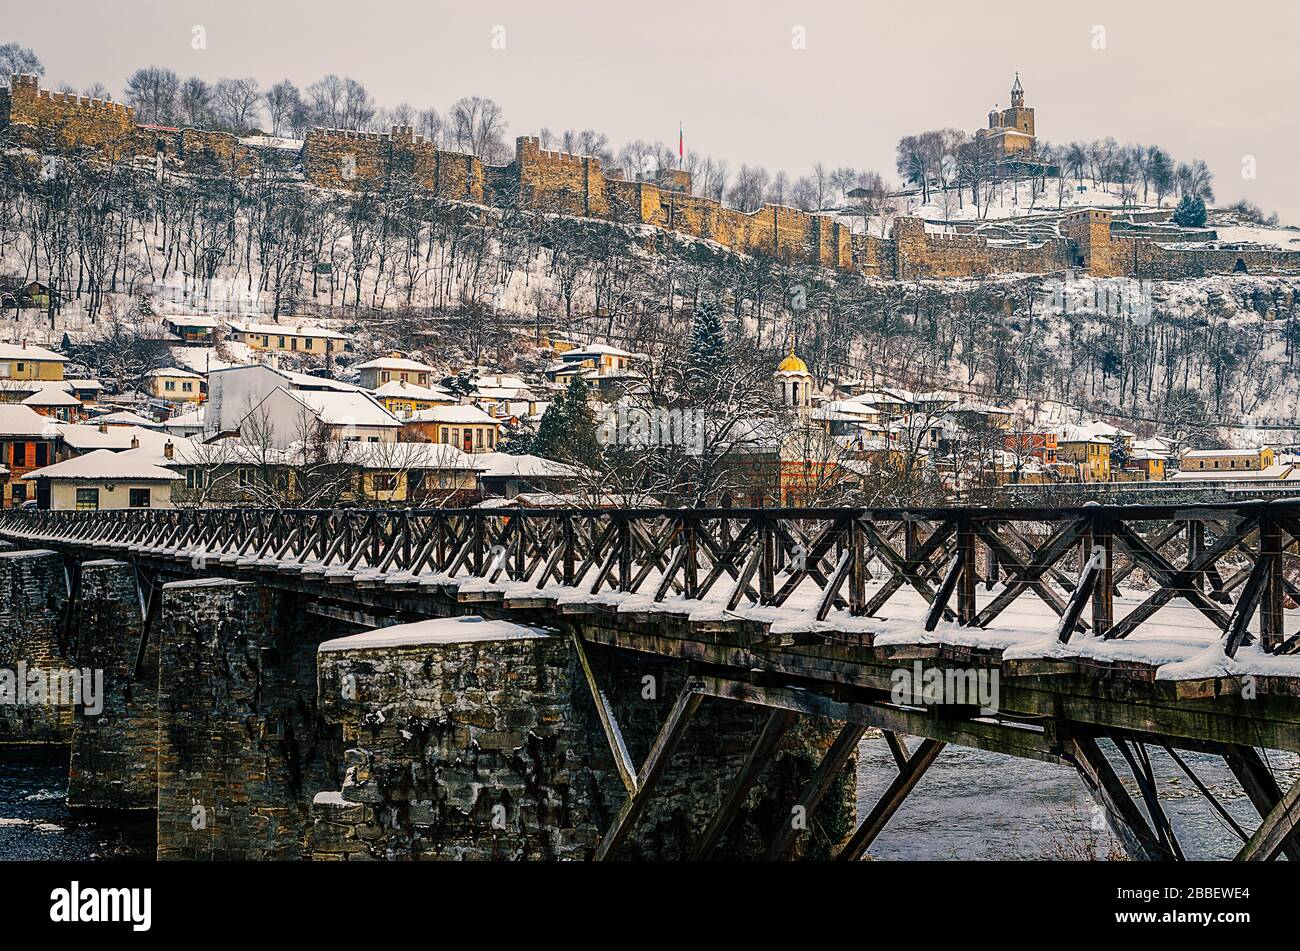 View of Tsarevets fortress and bishops bridge over River Yantra in winter Veliko Tarnovo Bulgaria Stock Photo